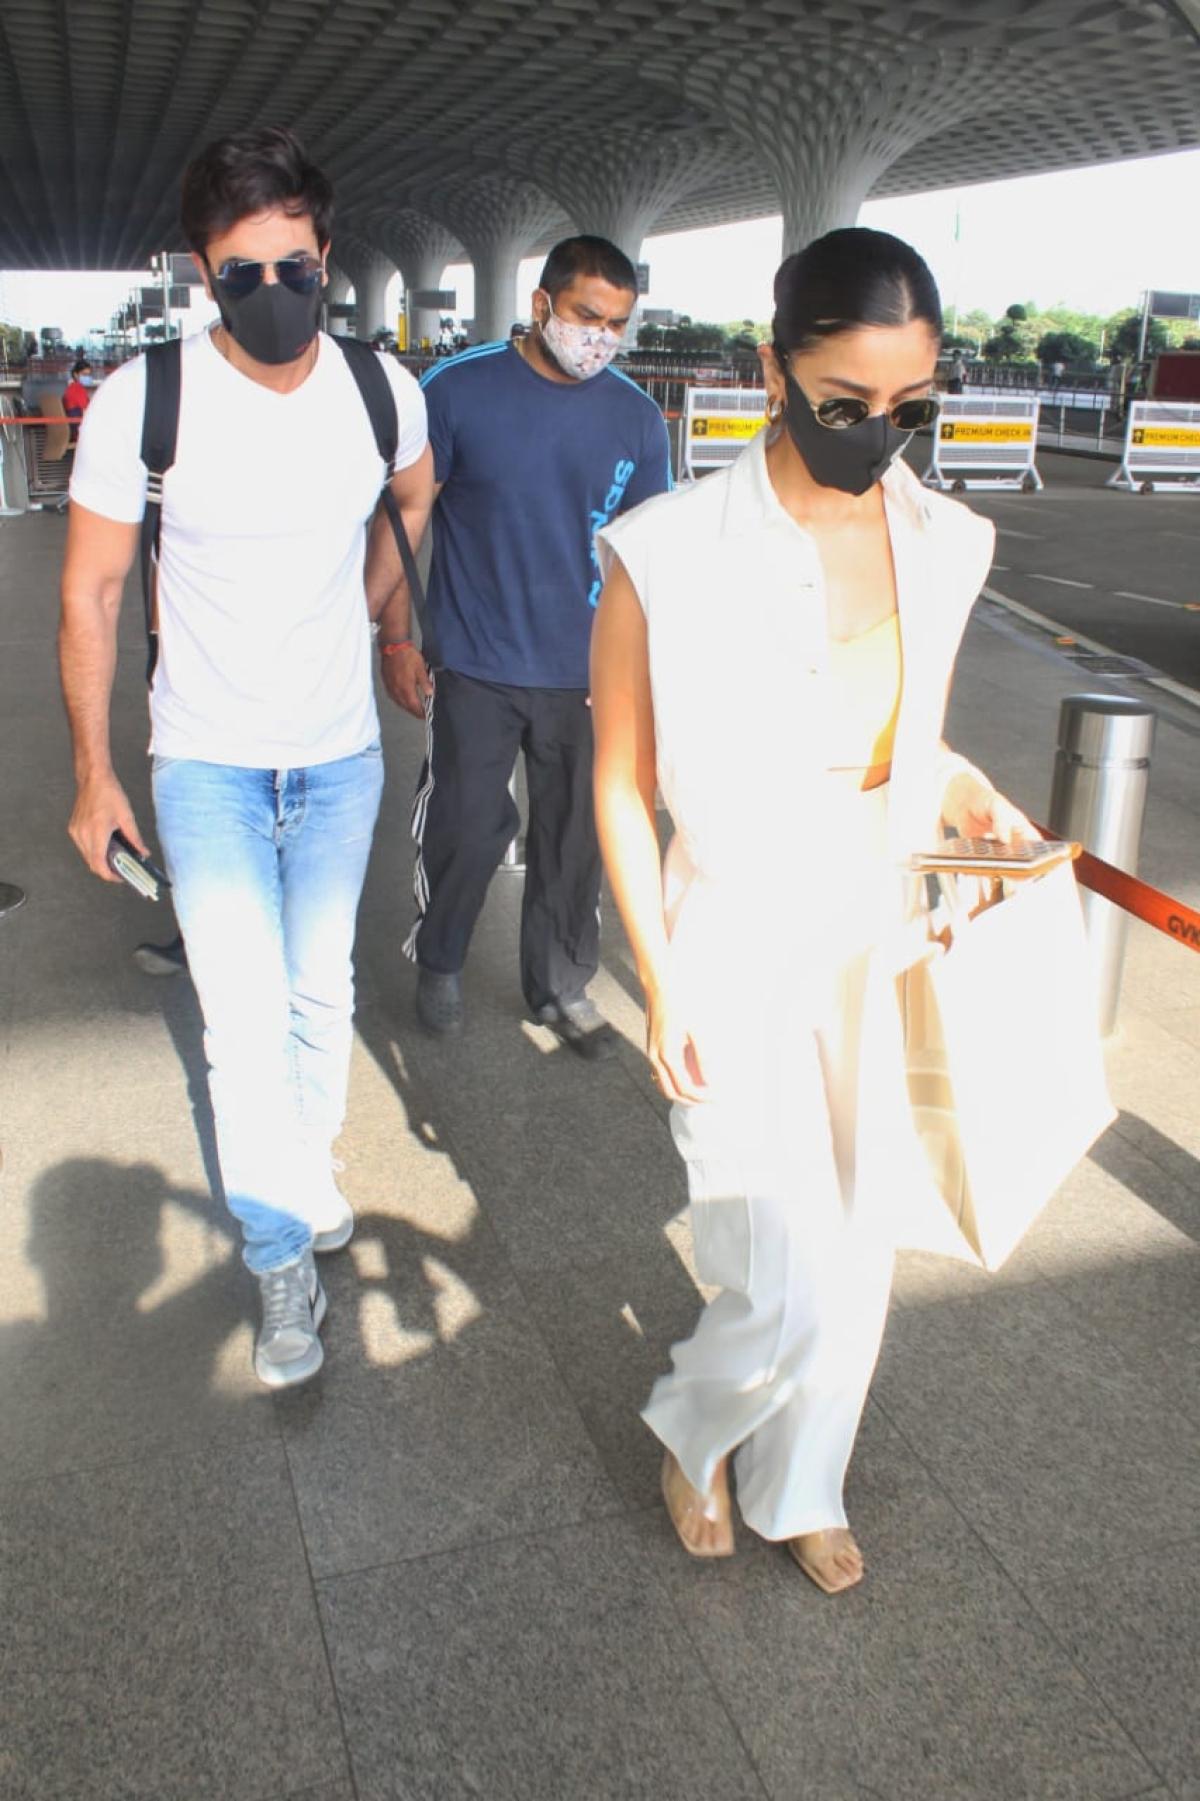 In Pics: Post COVID-19 recovery, Ranbir Kapoor and Alia Bhatt leave for Maldives amid Mumbai lockdown